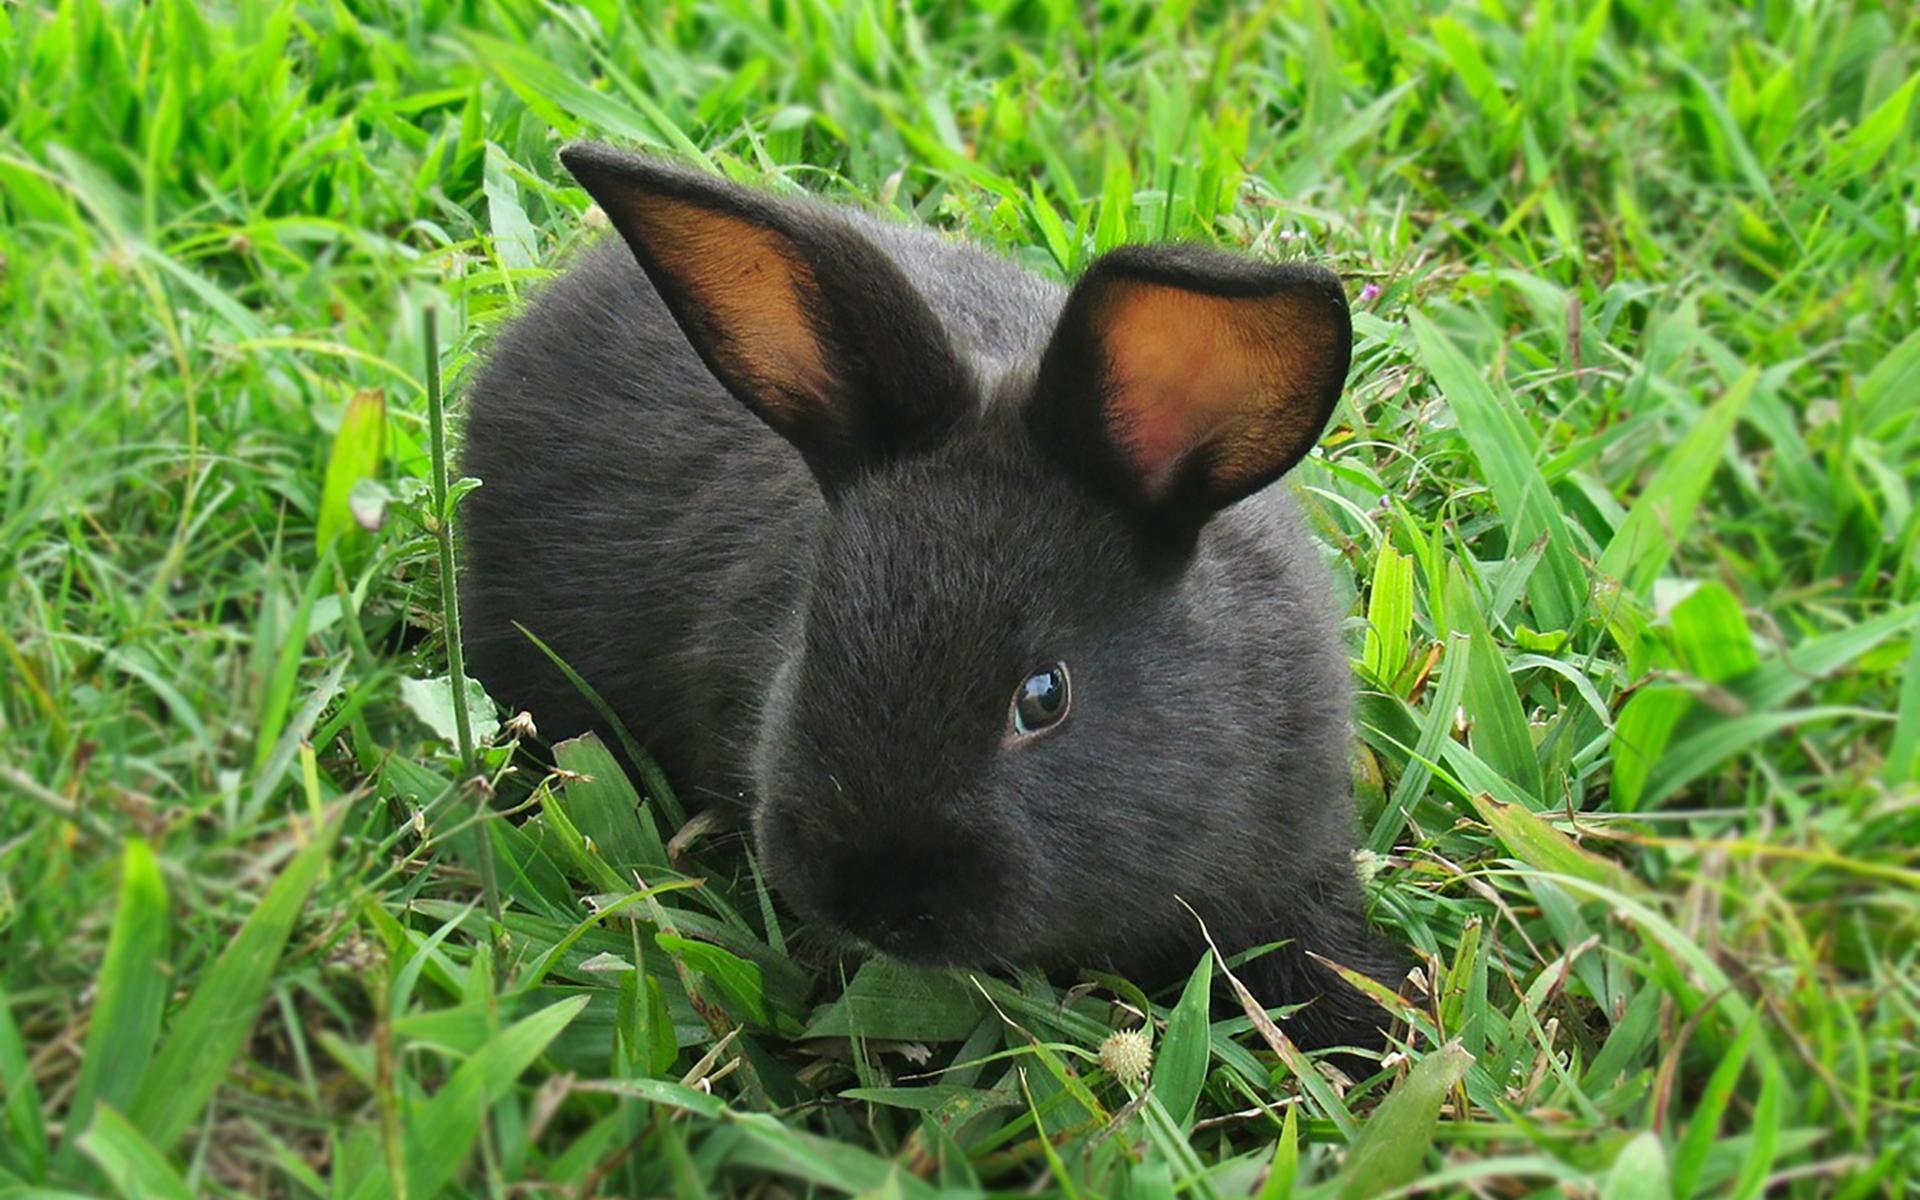 Blossom the little black rabbit enjoying the soft green grass in the farm's garden.